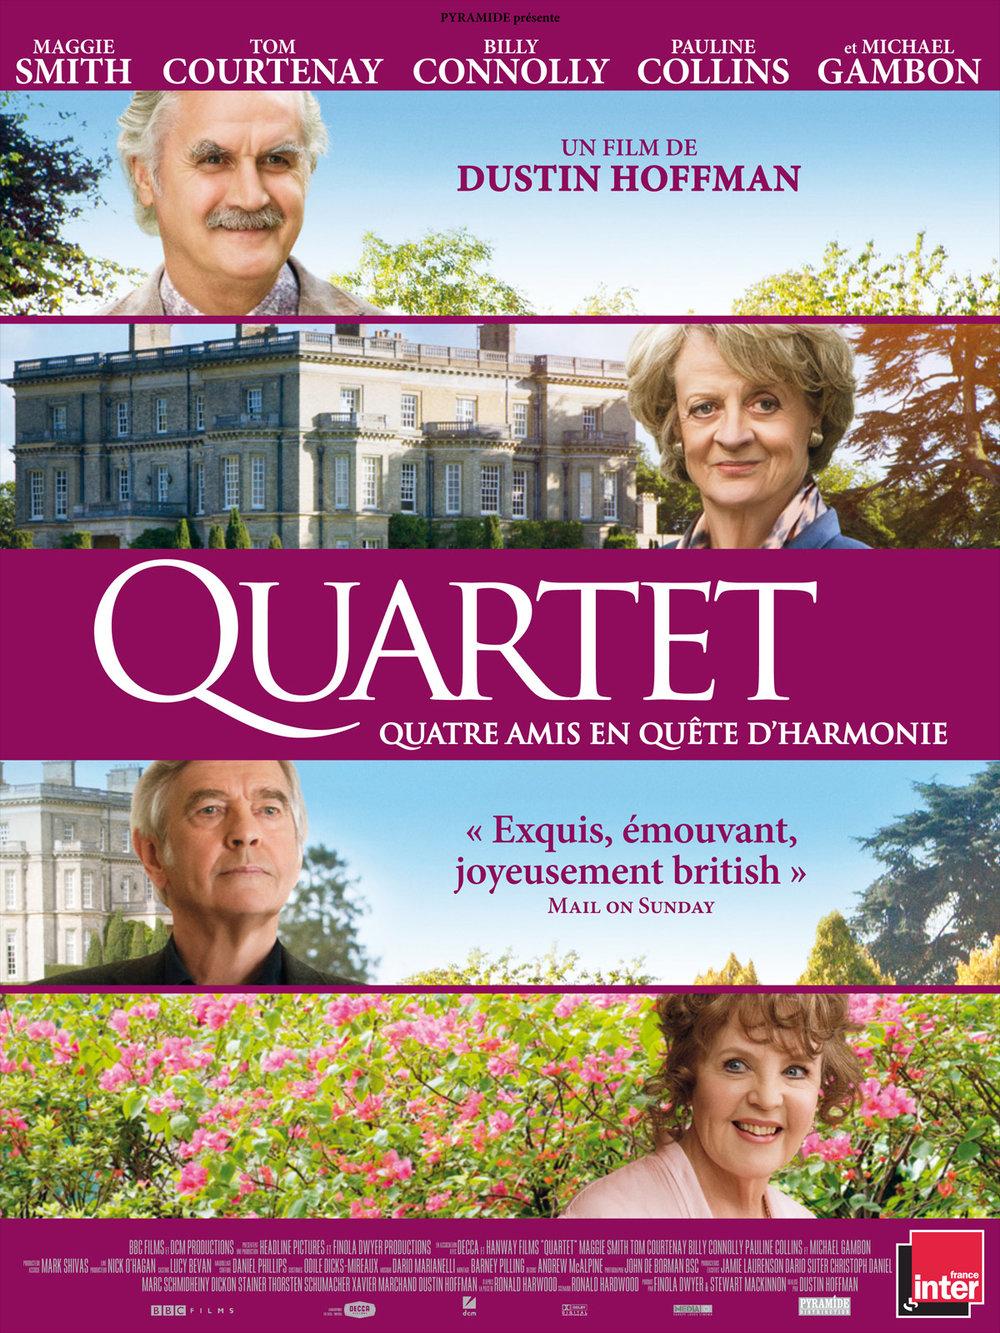 quartet-dustin-hoffman-film.jpg